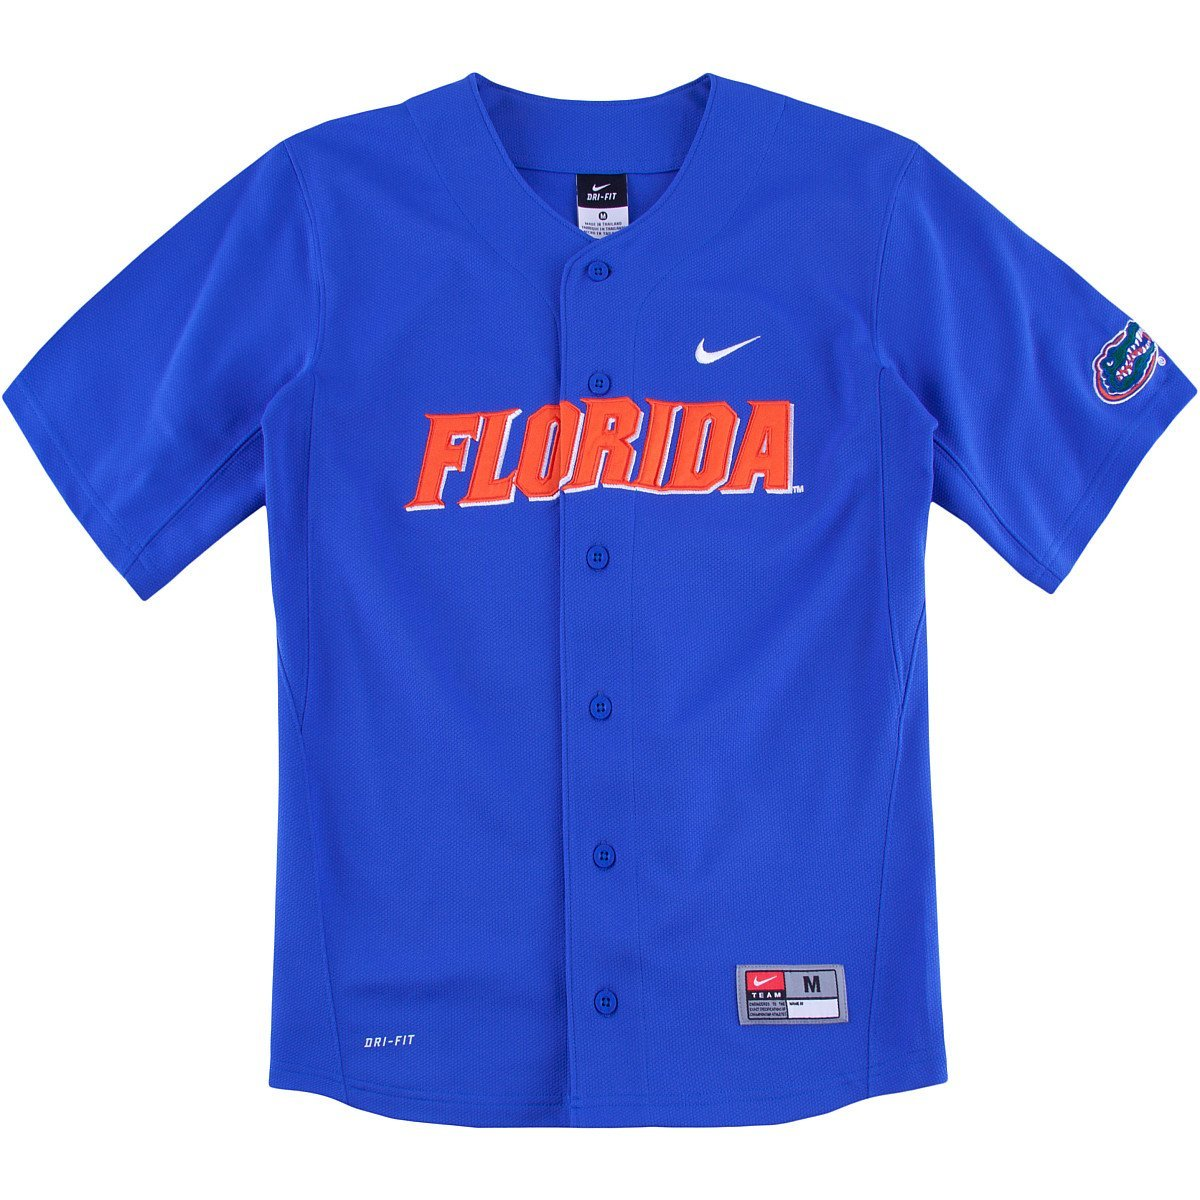 official photos 22fdf beeac Cheap Florida Gators Orange Jersey, find Florida Gators ...